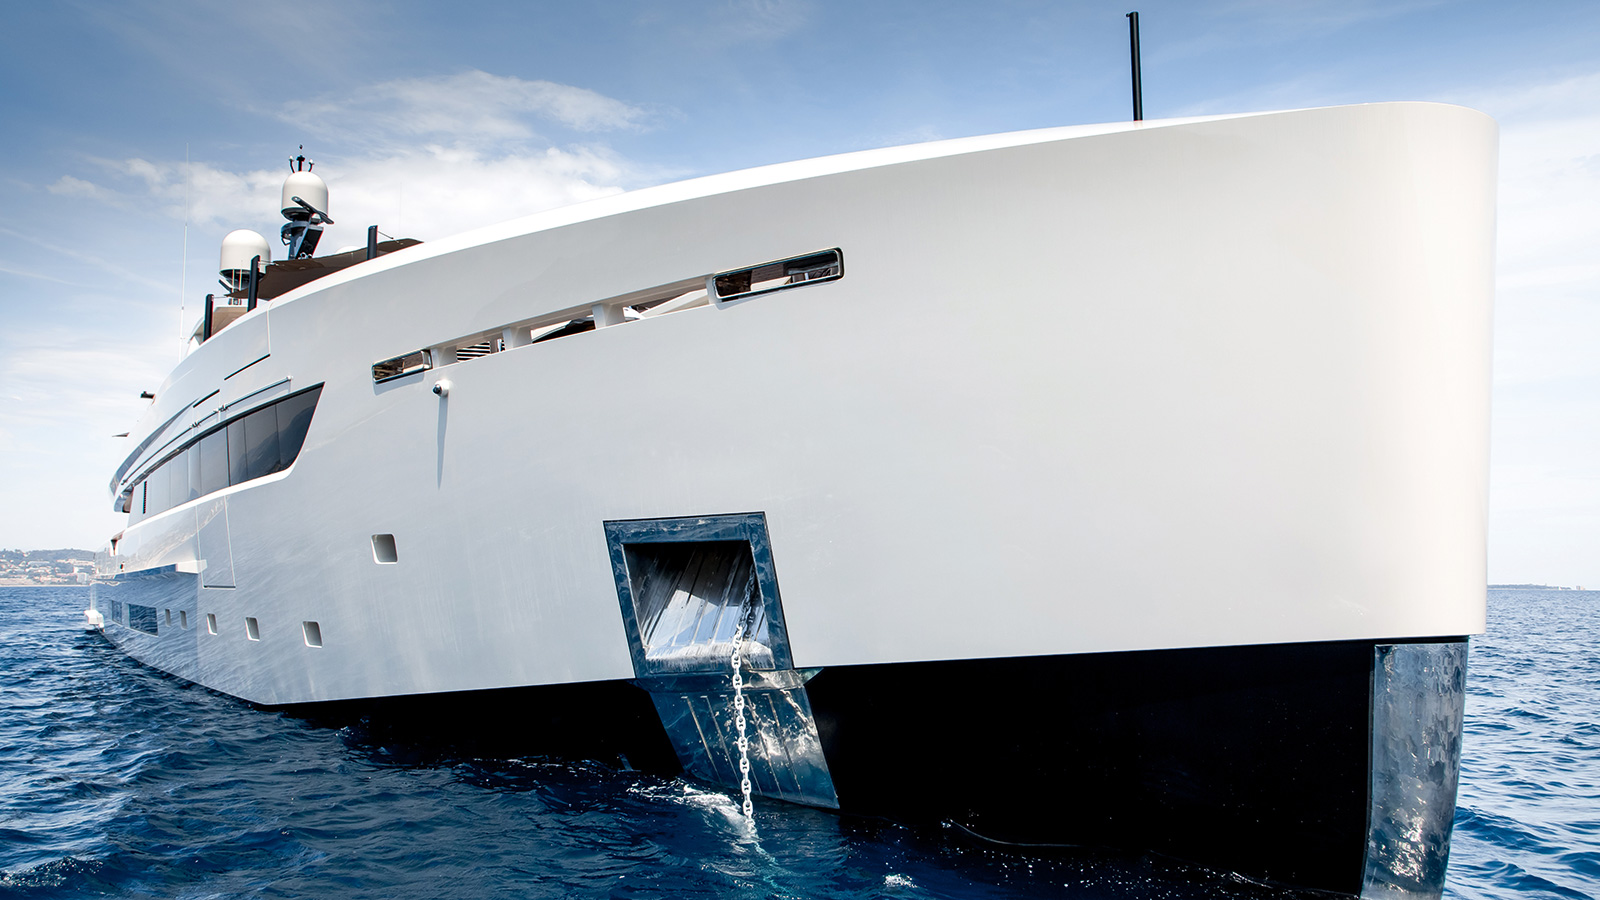 bow-view-of-the-tankoa-motor-yacht-vertige-credit-alberto-cocchi